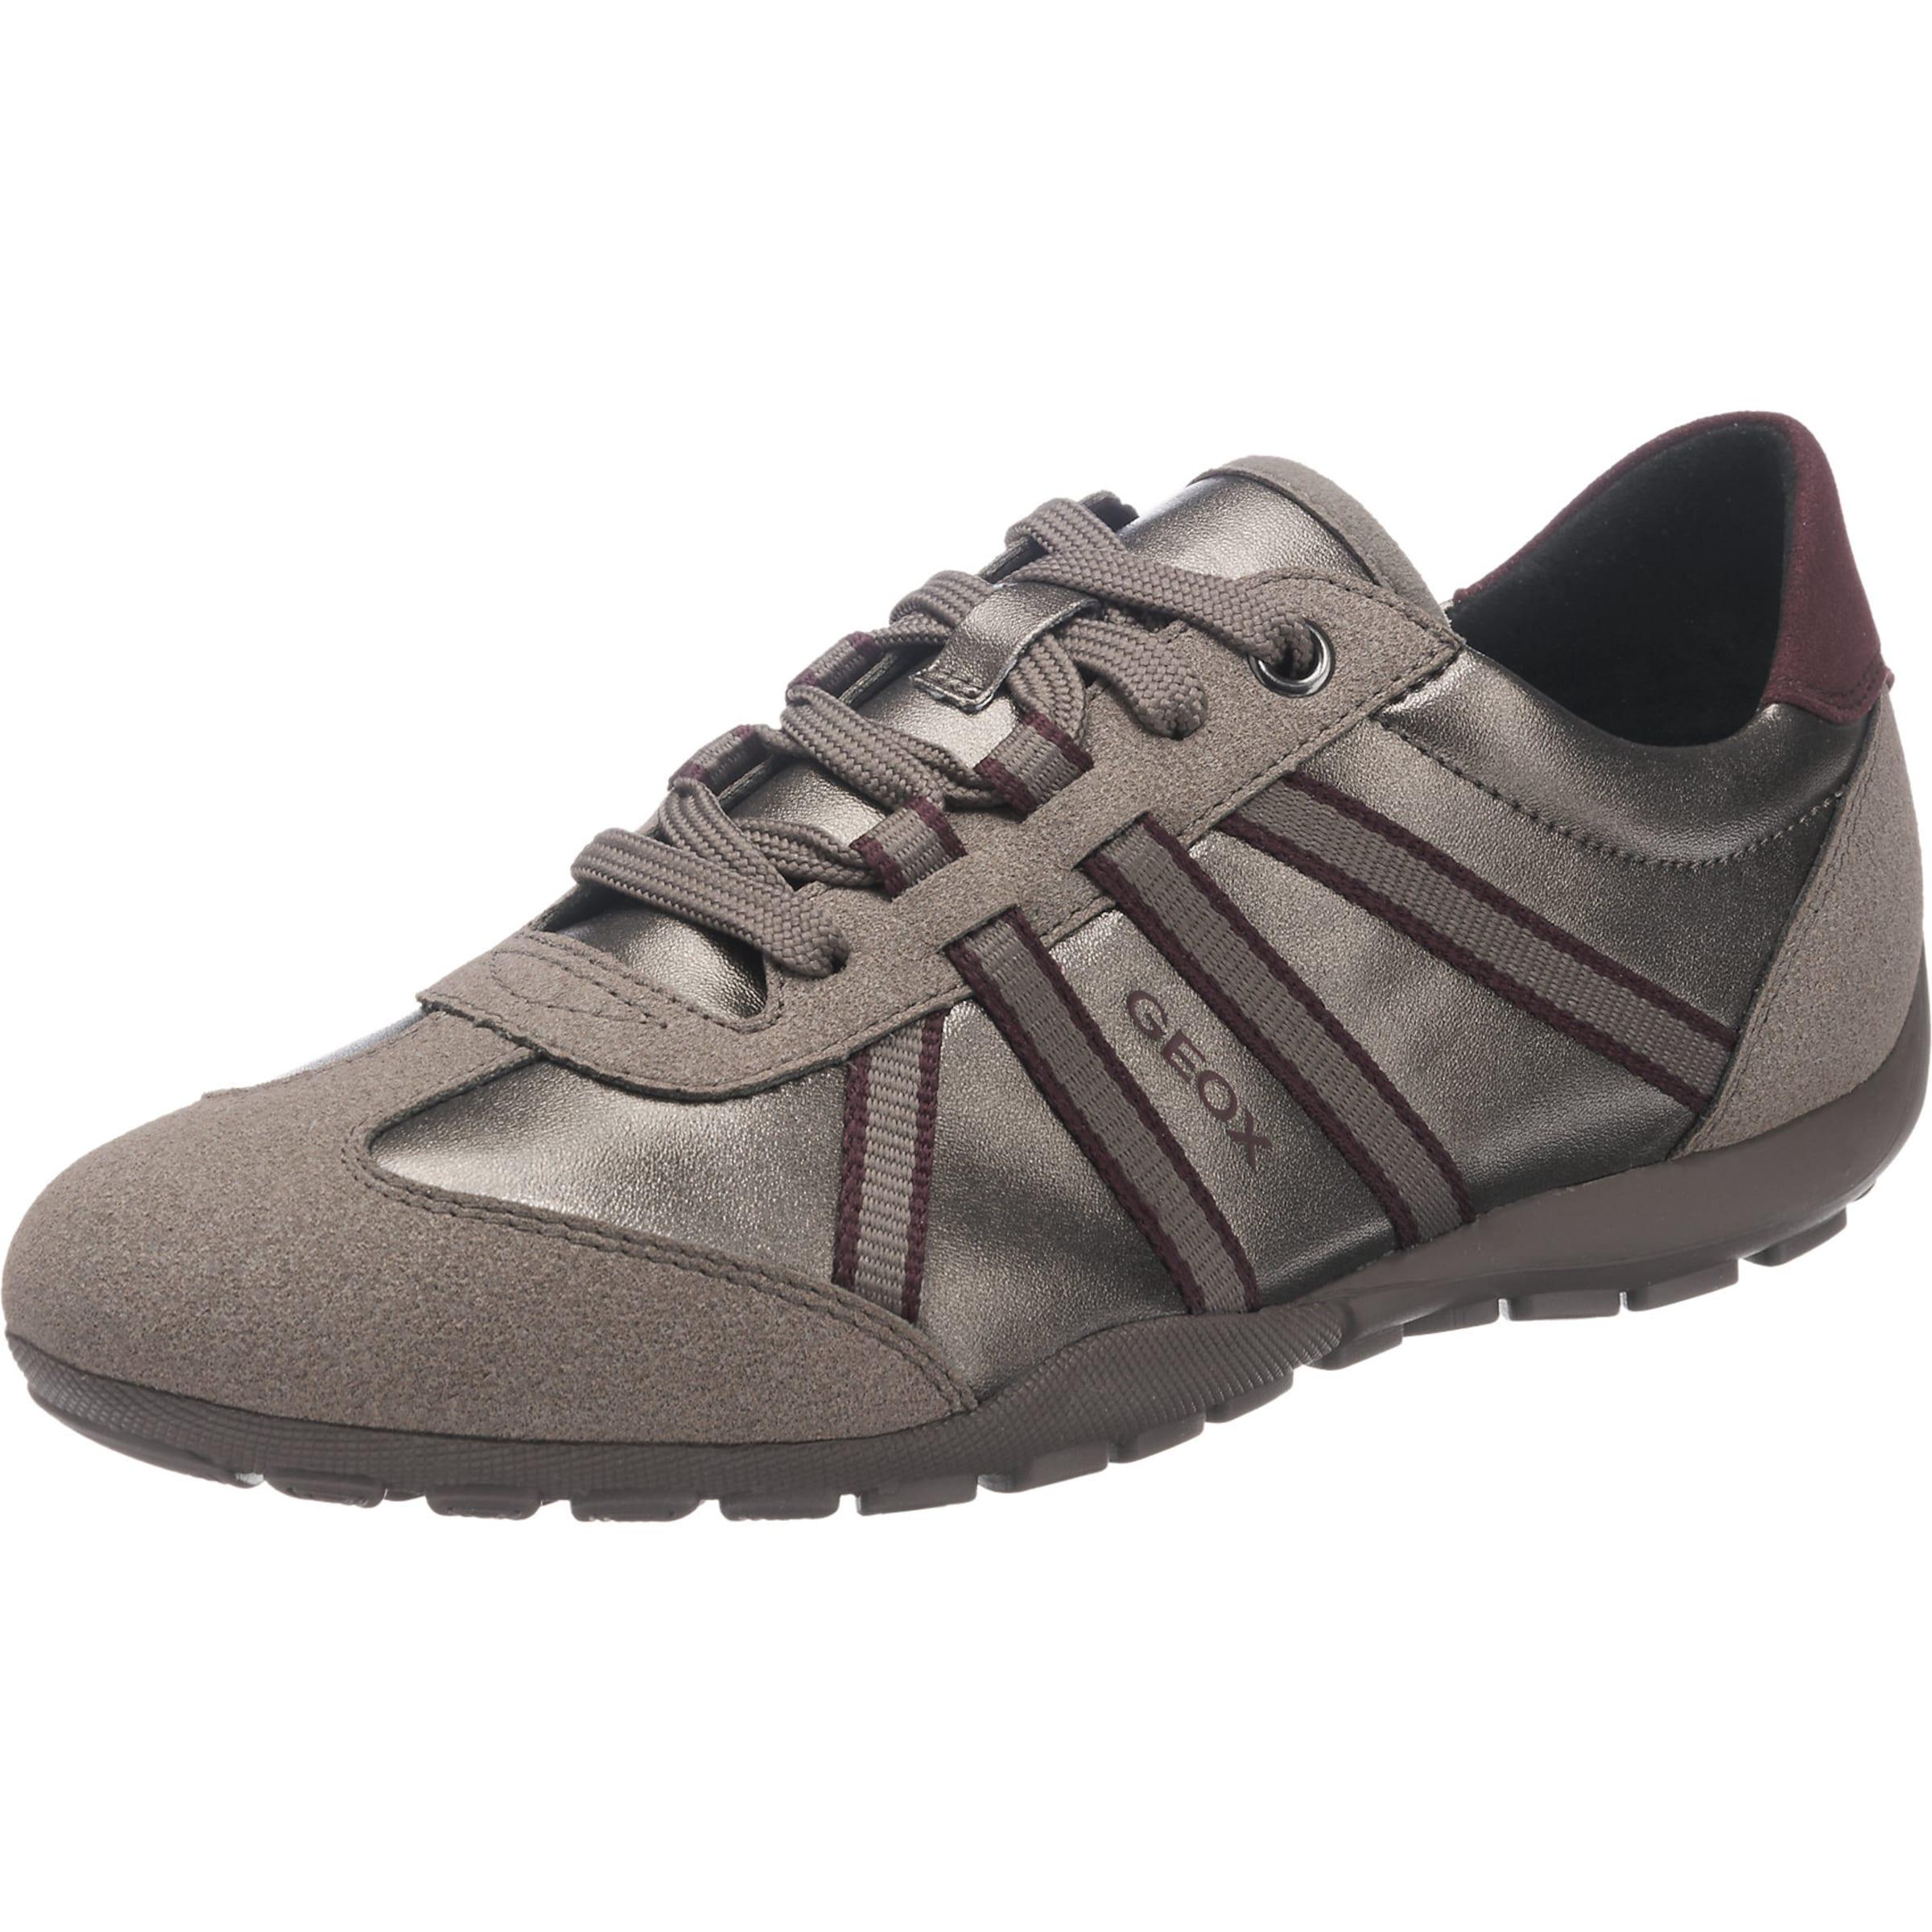 GEOX Ravex Sneakers Verschleißfeste billige Schuhe